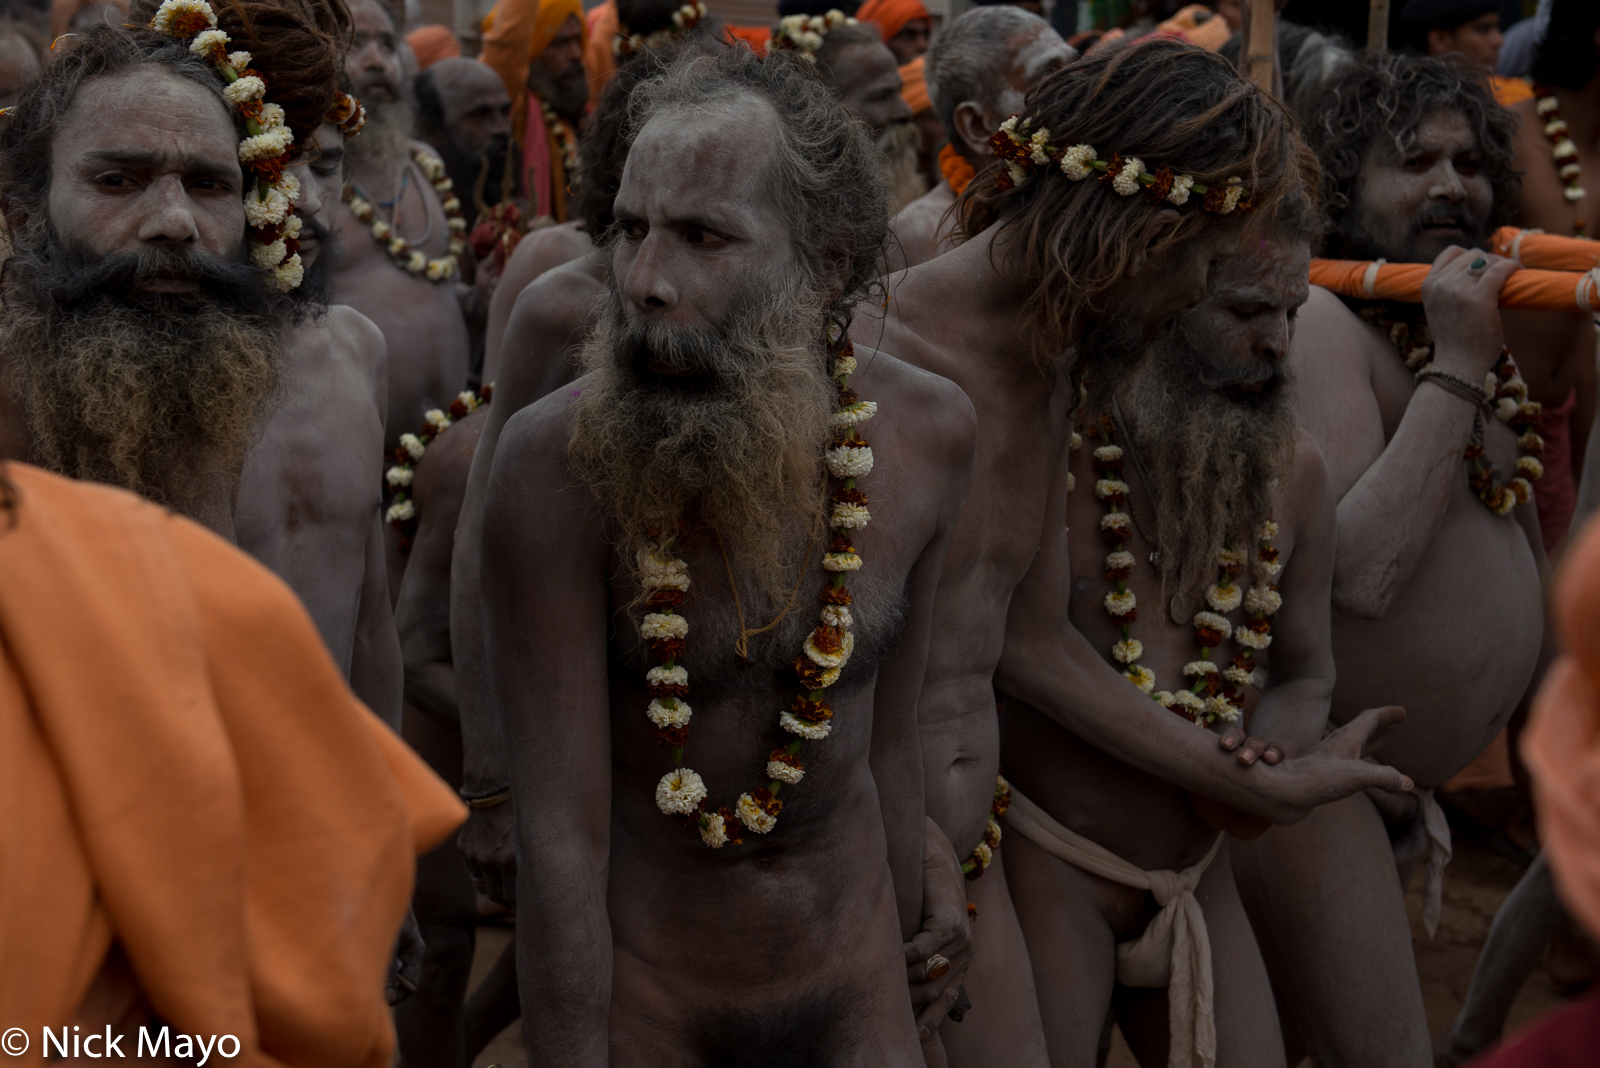 Chhattisgarh, Festival, India, Procession, Sadhu, photo